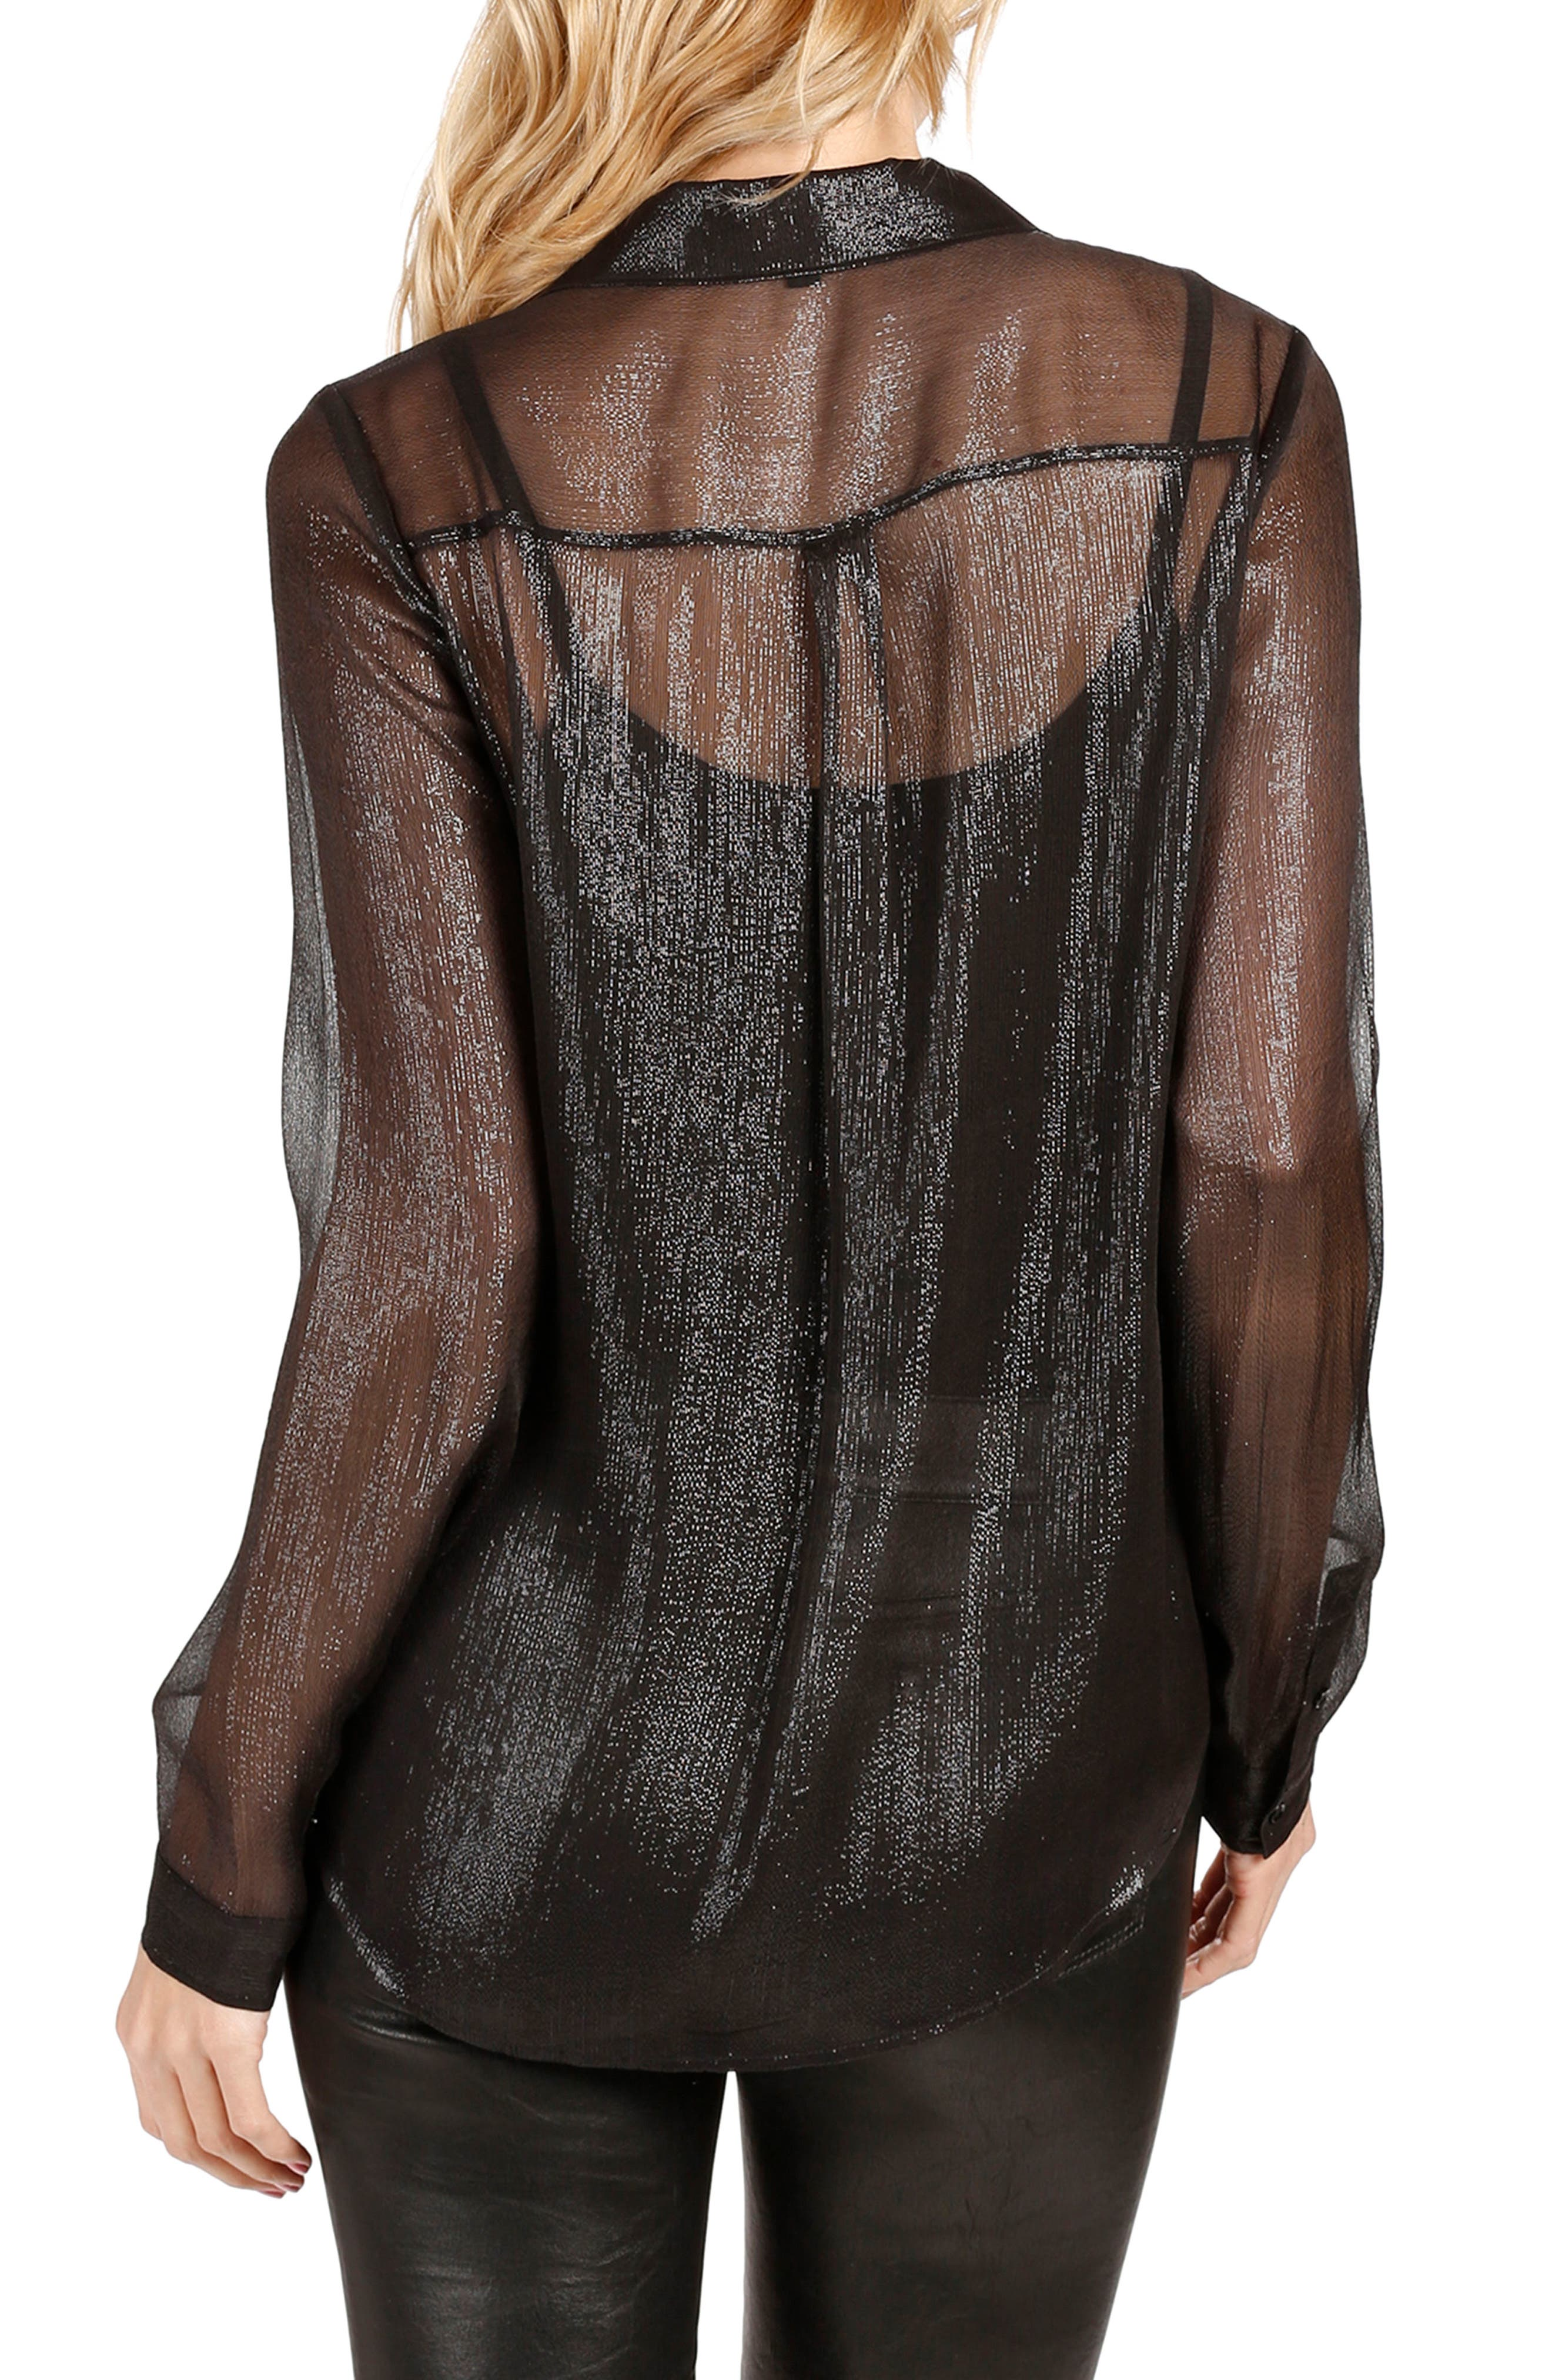 Everleigh Shirt,                             Alternate thumbnail 2, color,                             001